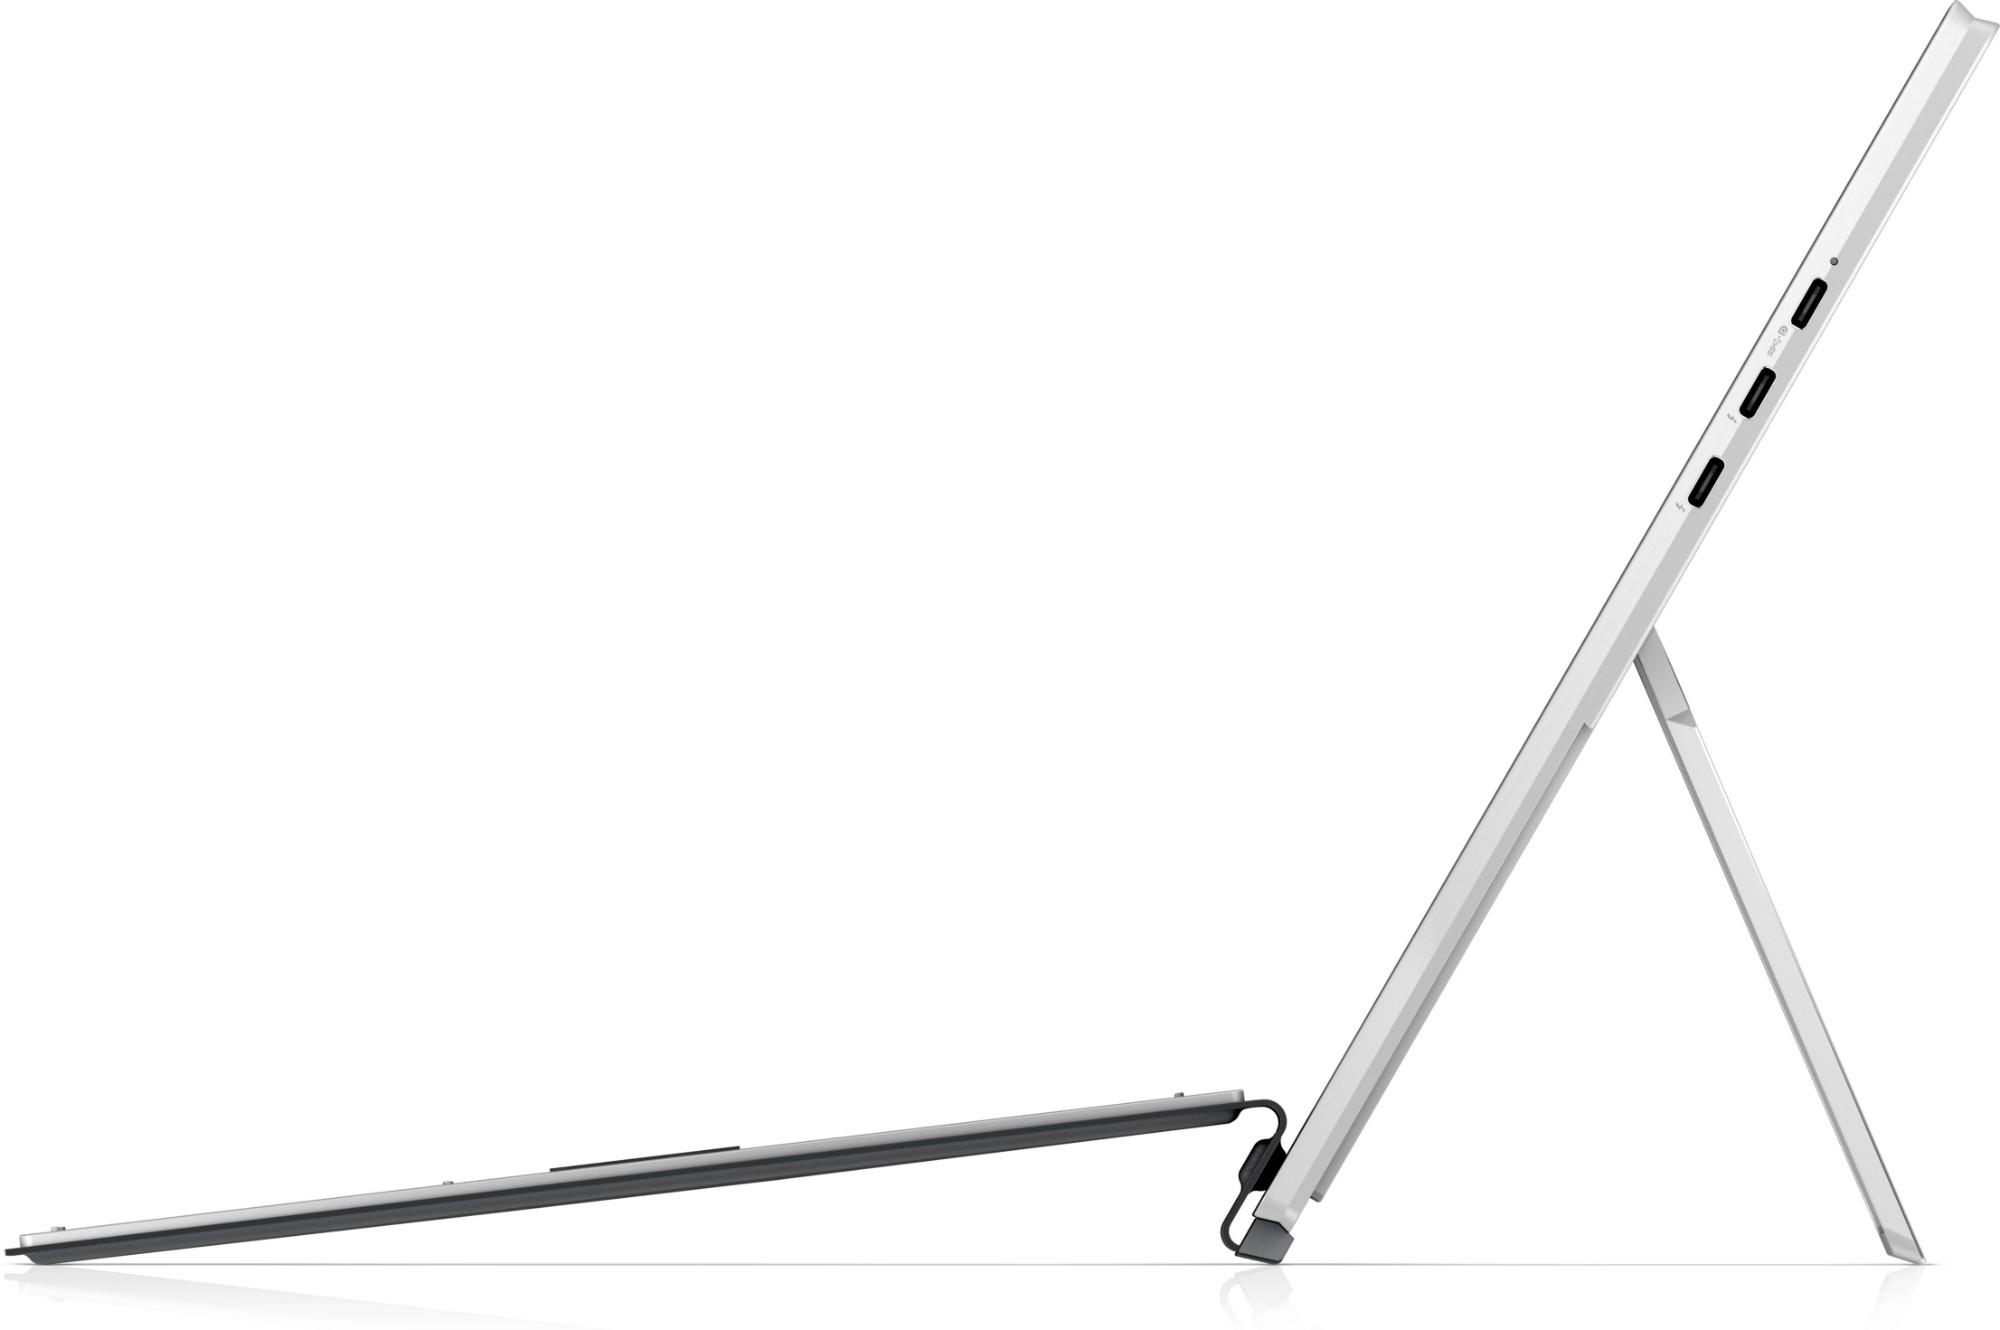 HP Elite x2 1013 G3 Silver Hybrid (2-in-1) 33 cm (13